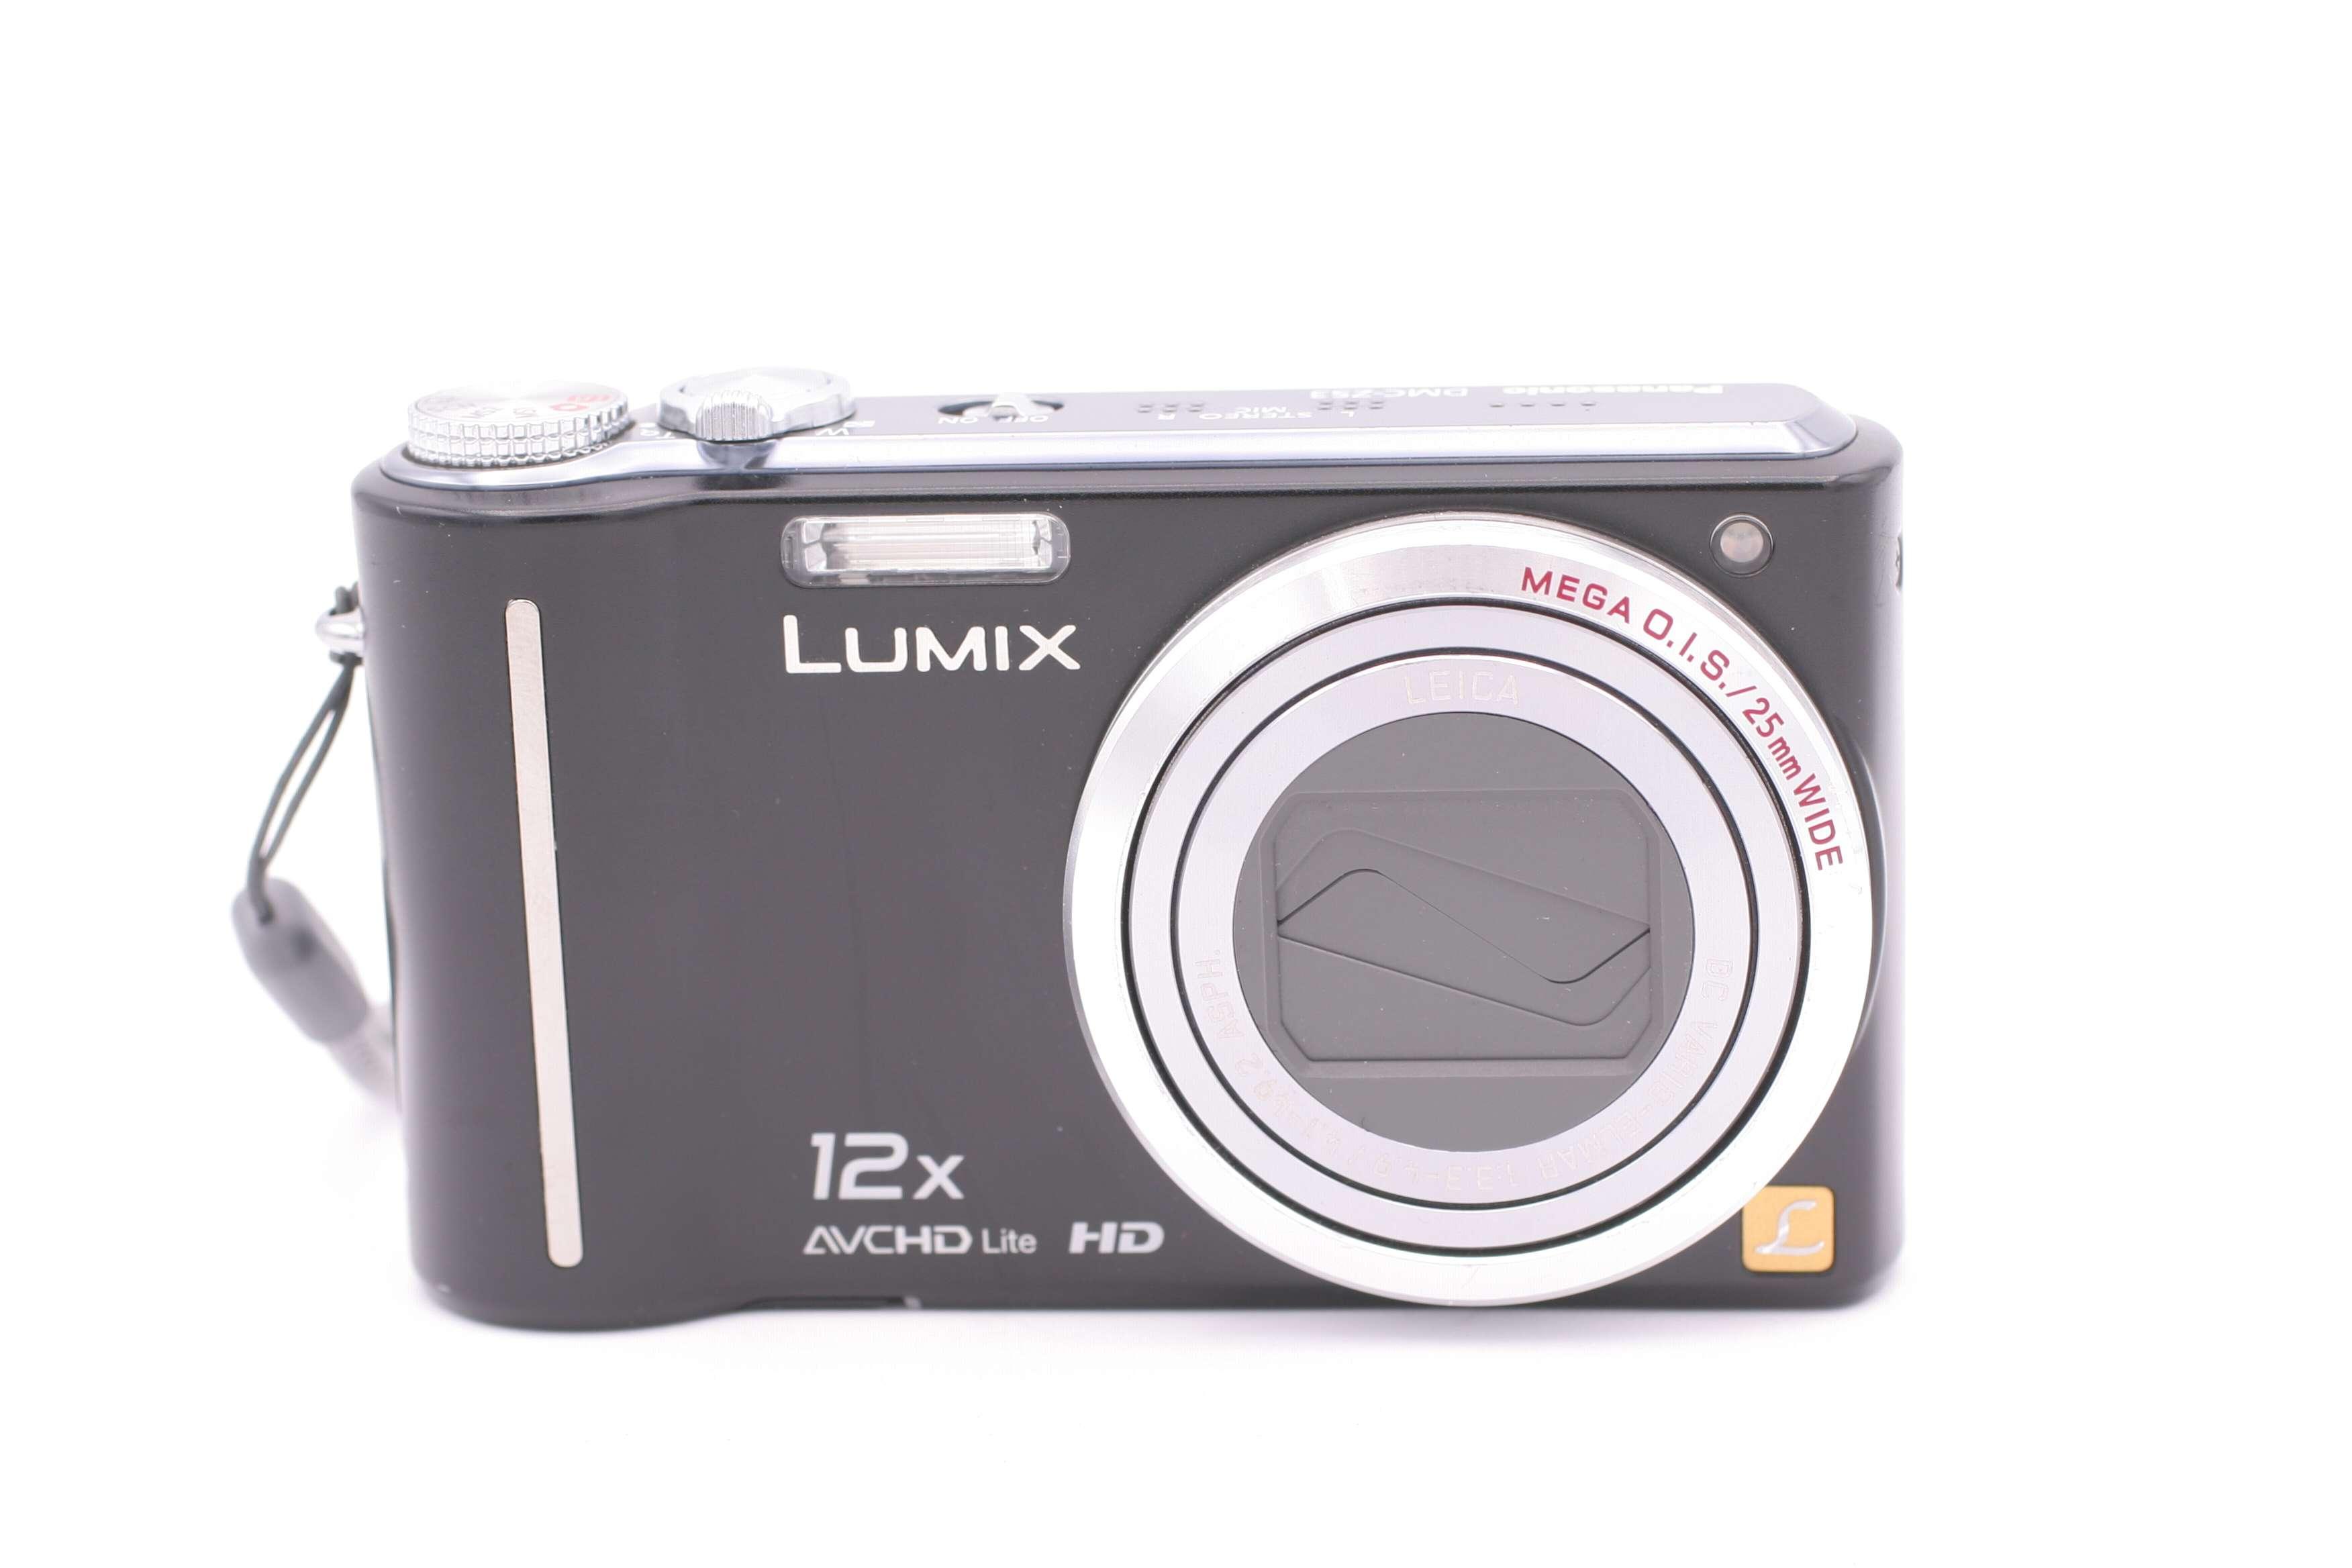 panasonic lumix dmc zs3 dmc tz7 10 1mp digital camera black rh ebay co uk